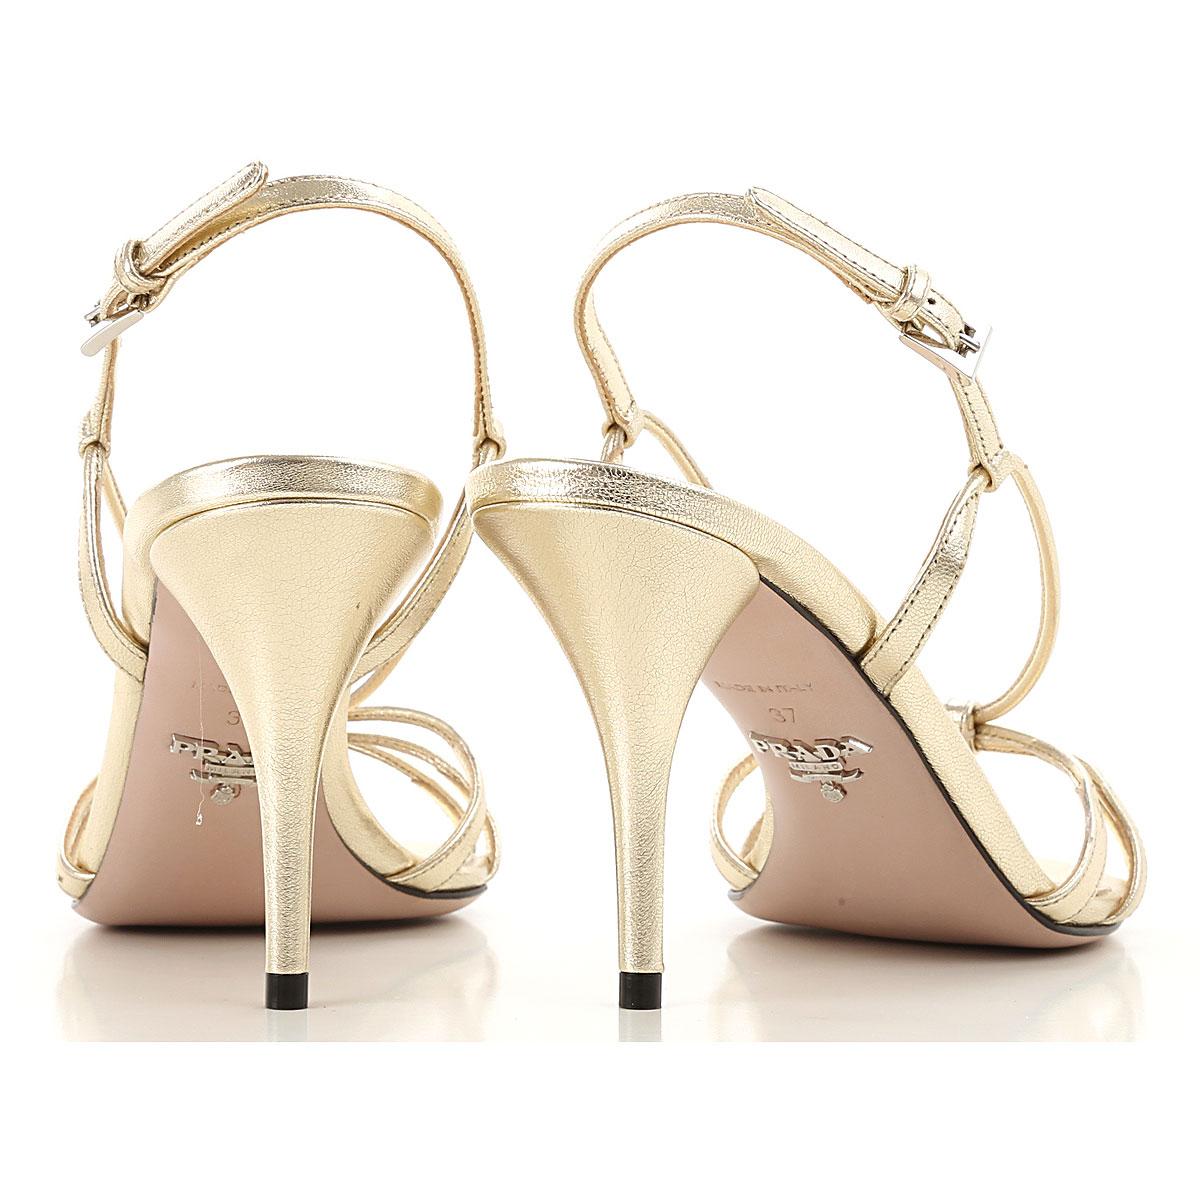 Para Pirita verano Zapatos 2019 Prada Primavera Mujer nbsp; vYw5qxSRn